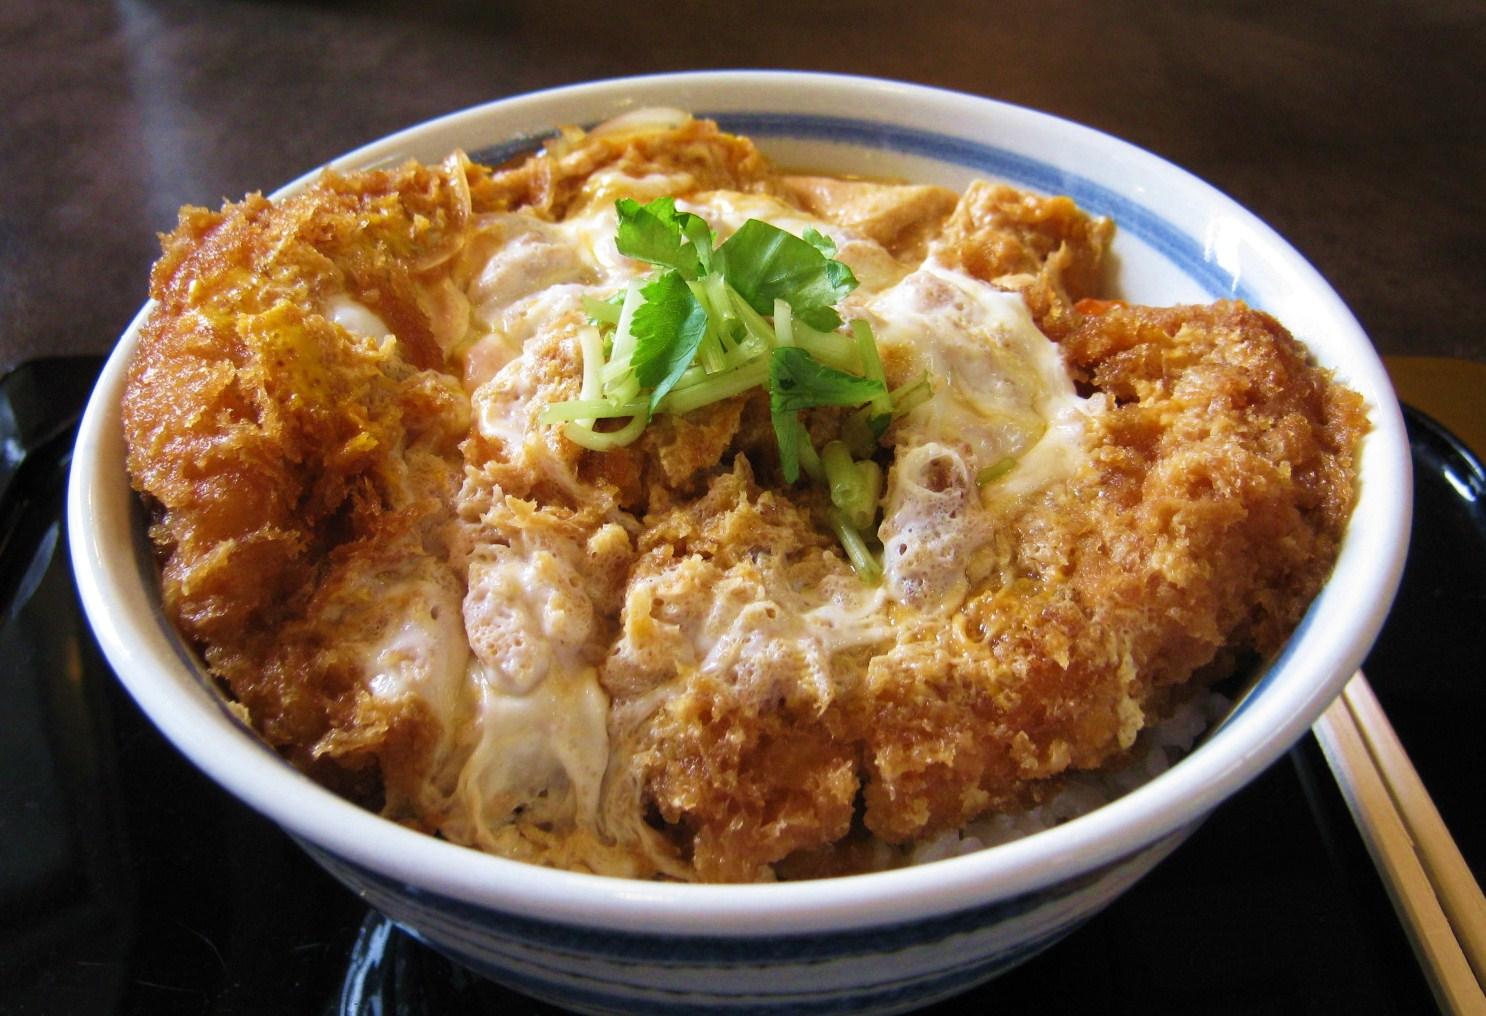 Tonkatsu Sauce Whole Foods